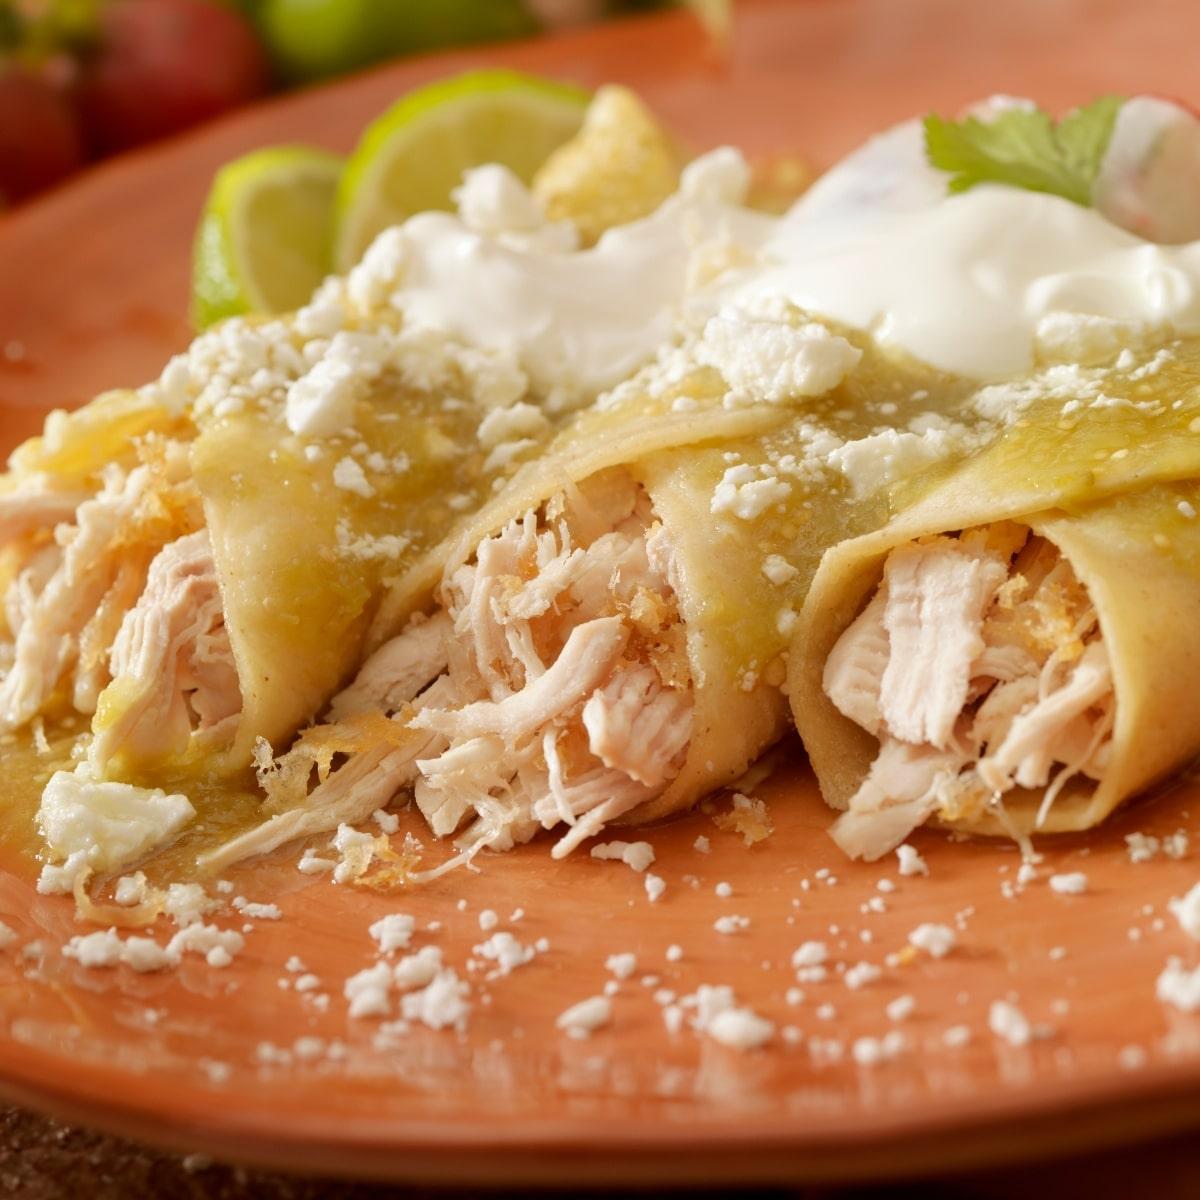 Enchiladas Verdes - Green Enchiladas. Chicken Enchiladas with green sauce. Served on a stoneware plate. Enchiladas are sprinkled with crumbled cotija cheese.